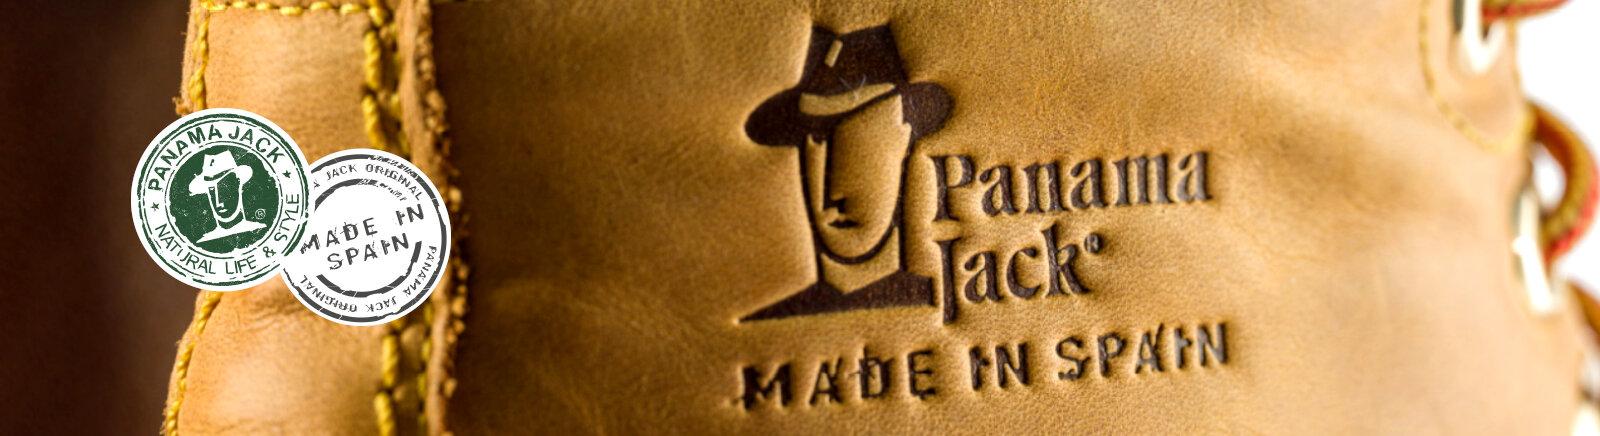 Gisy: Panama Jack Damenschuhe online shoppen